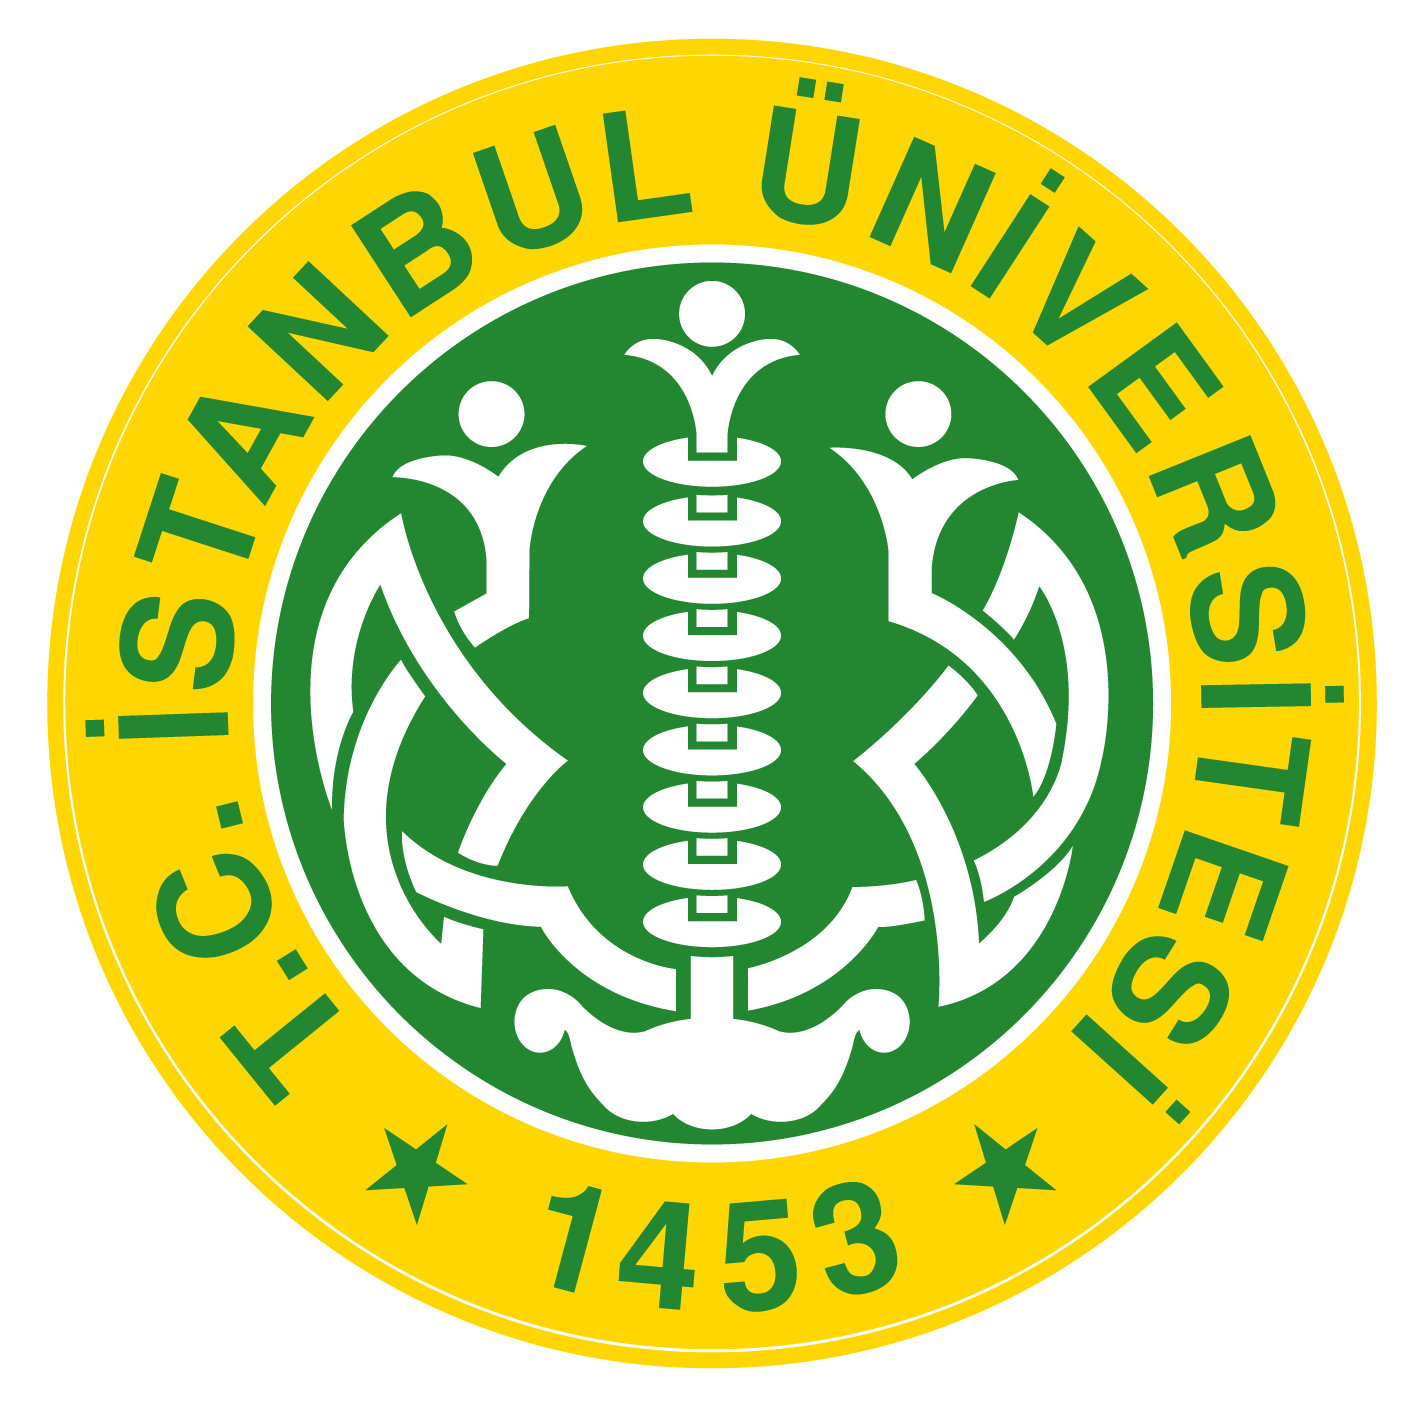 İÜ – İstanbul Üniversitesi Logo Vector [istanbul.edu.tr] Vector EPS Free  Download, Logo, Icons, Clipart | Istanbul, Üniversite, Logolar